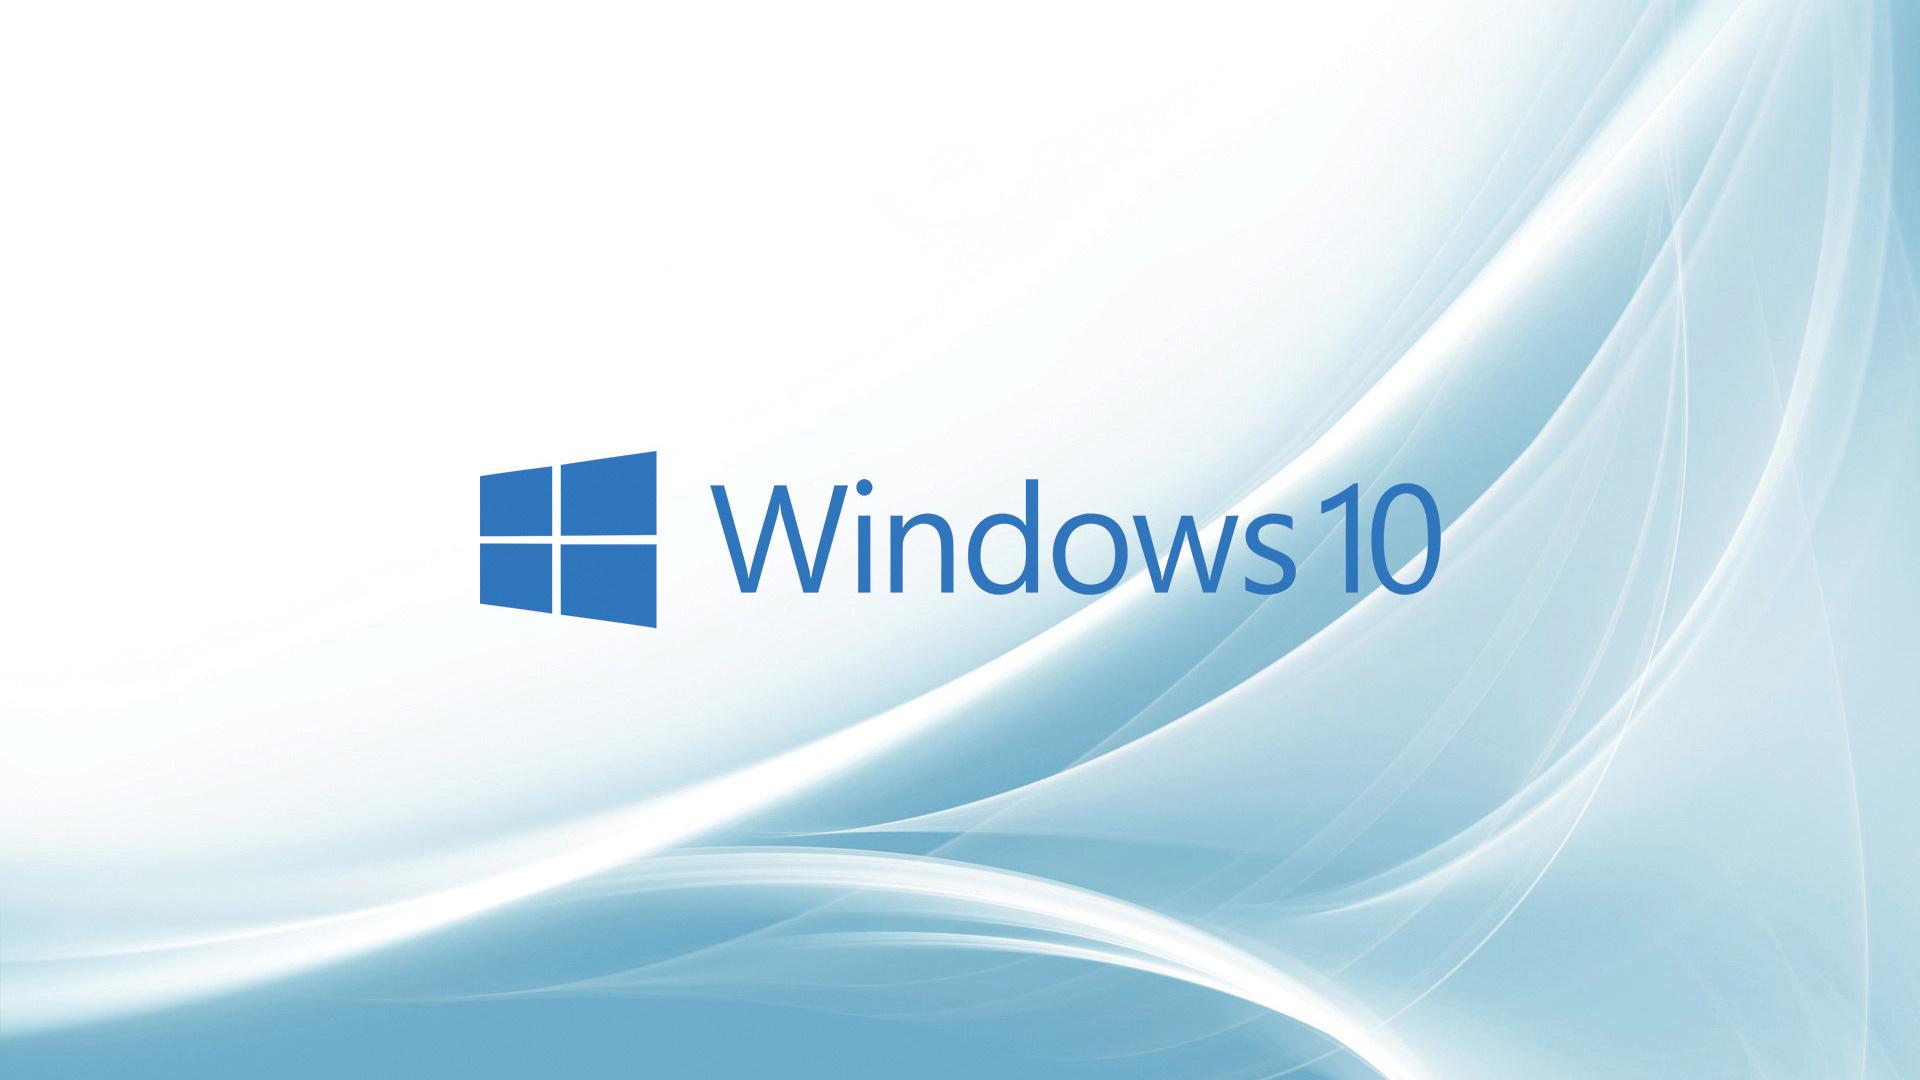 1920x1080Windows10WallpaperLogoBlue.jpg (1920×1080)